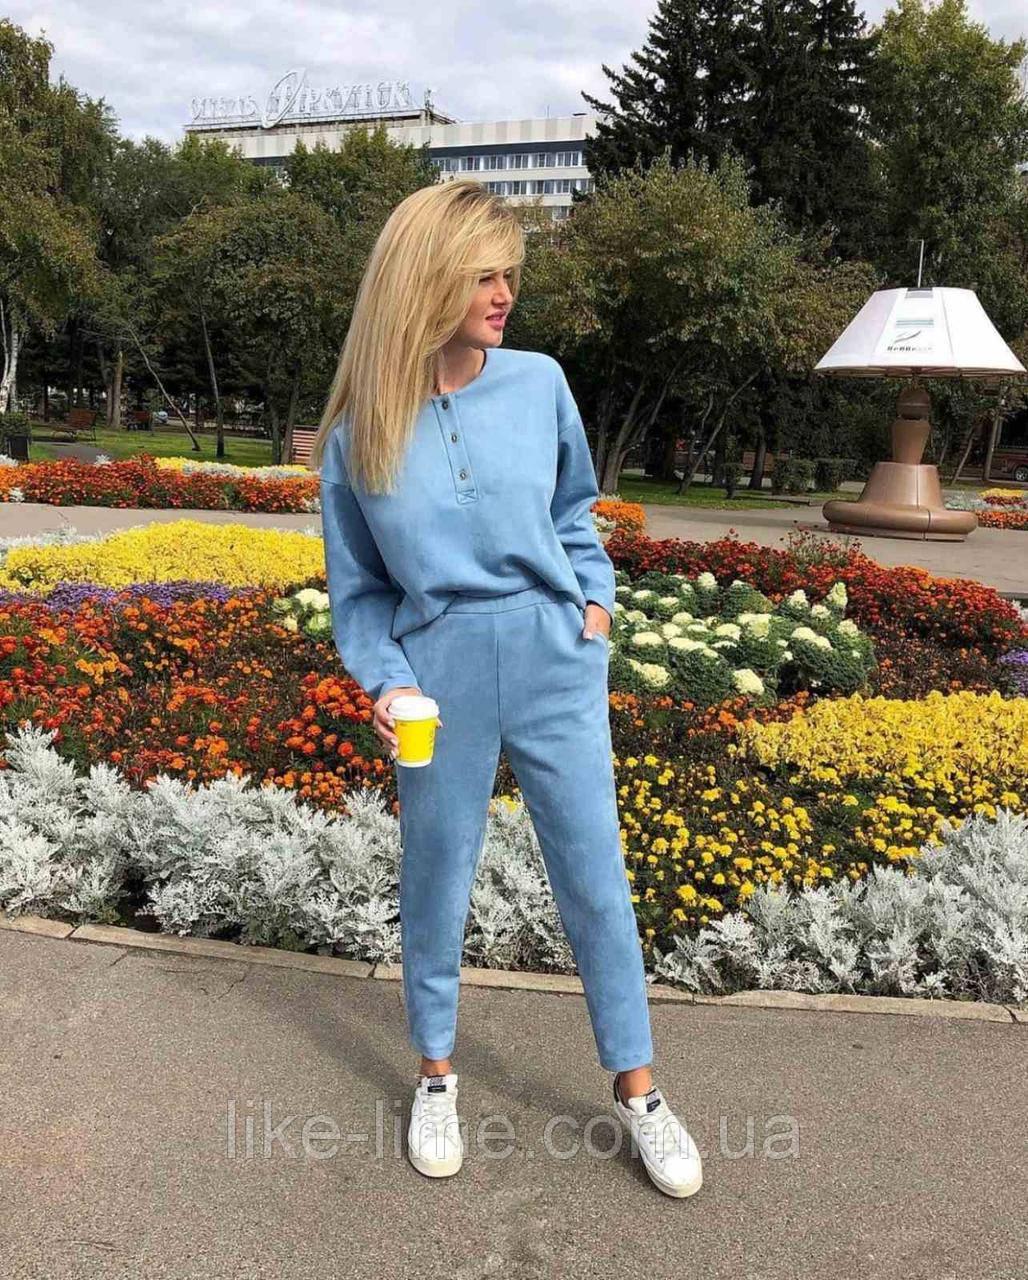 Спортивный костюм, женский спортивный костюм, прогулочный костюм